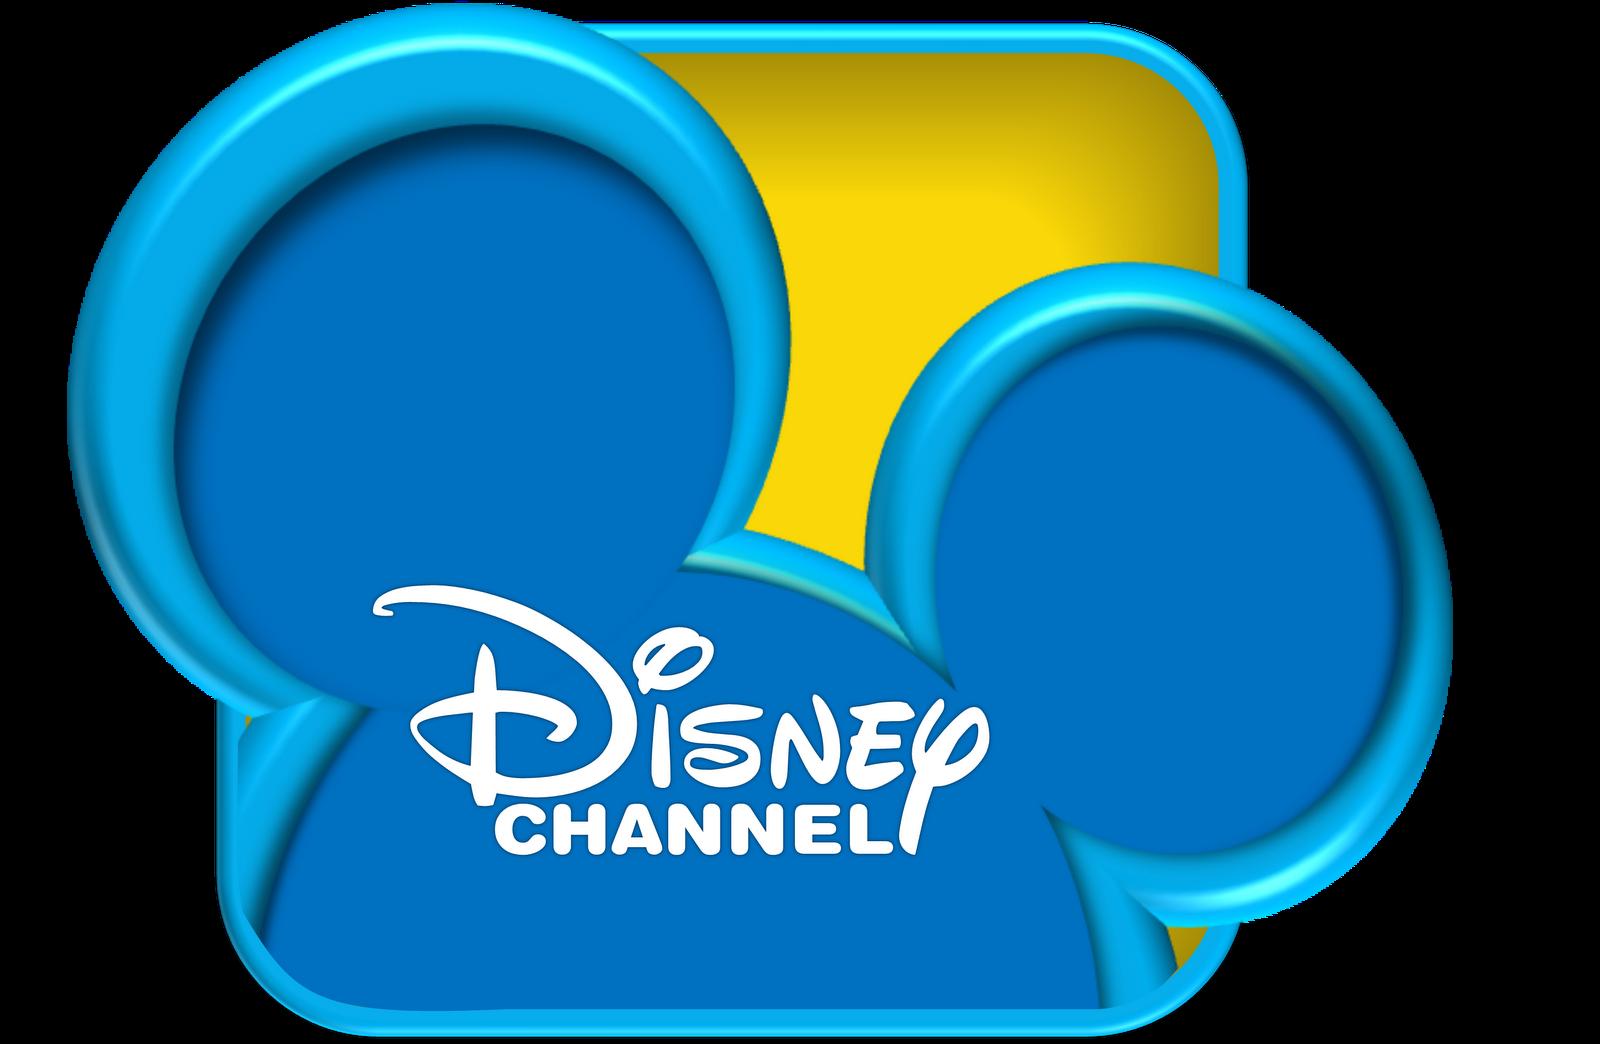 Disney_Channel_logo.png